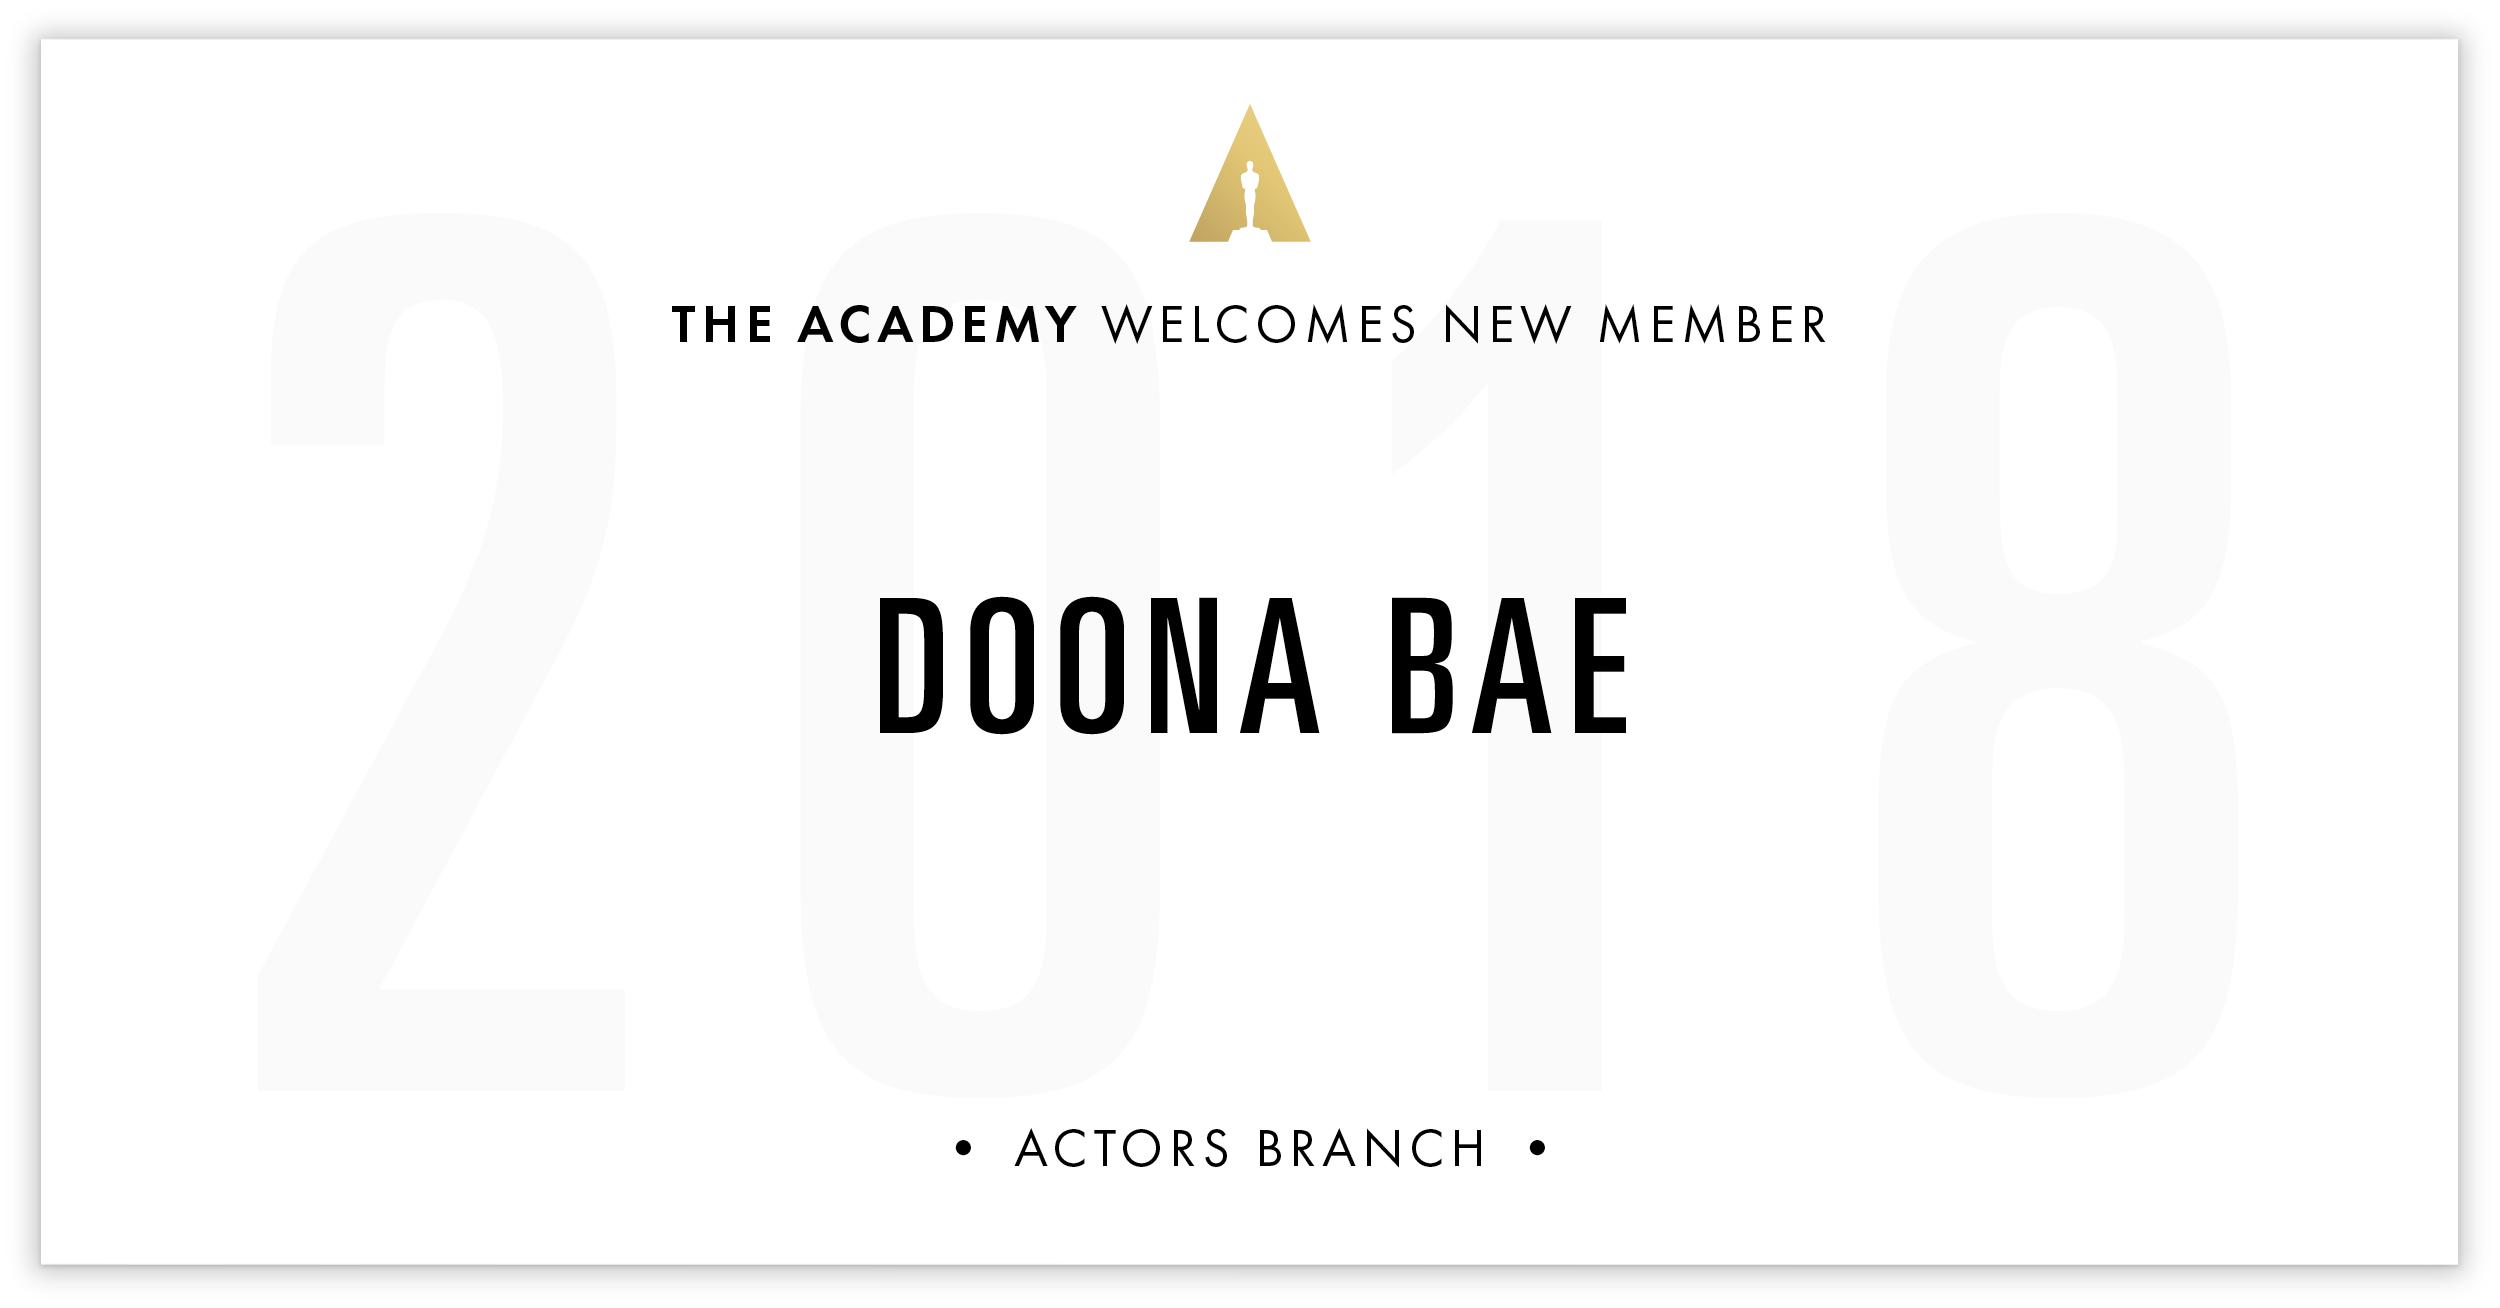 Doona Bae is invited!